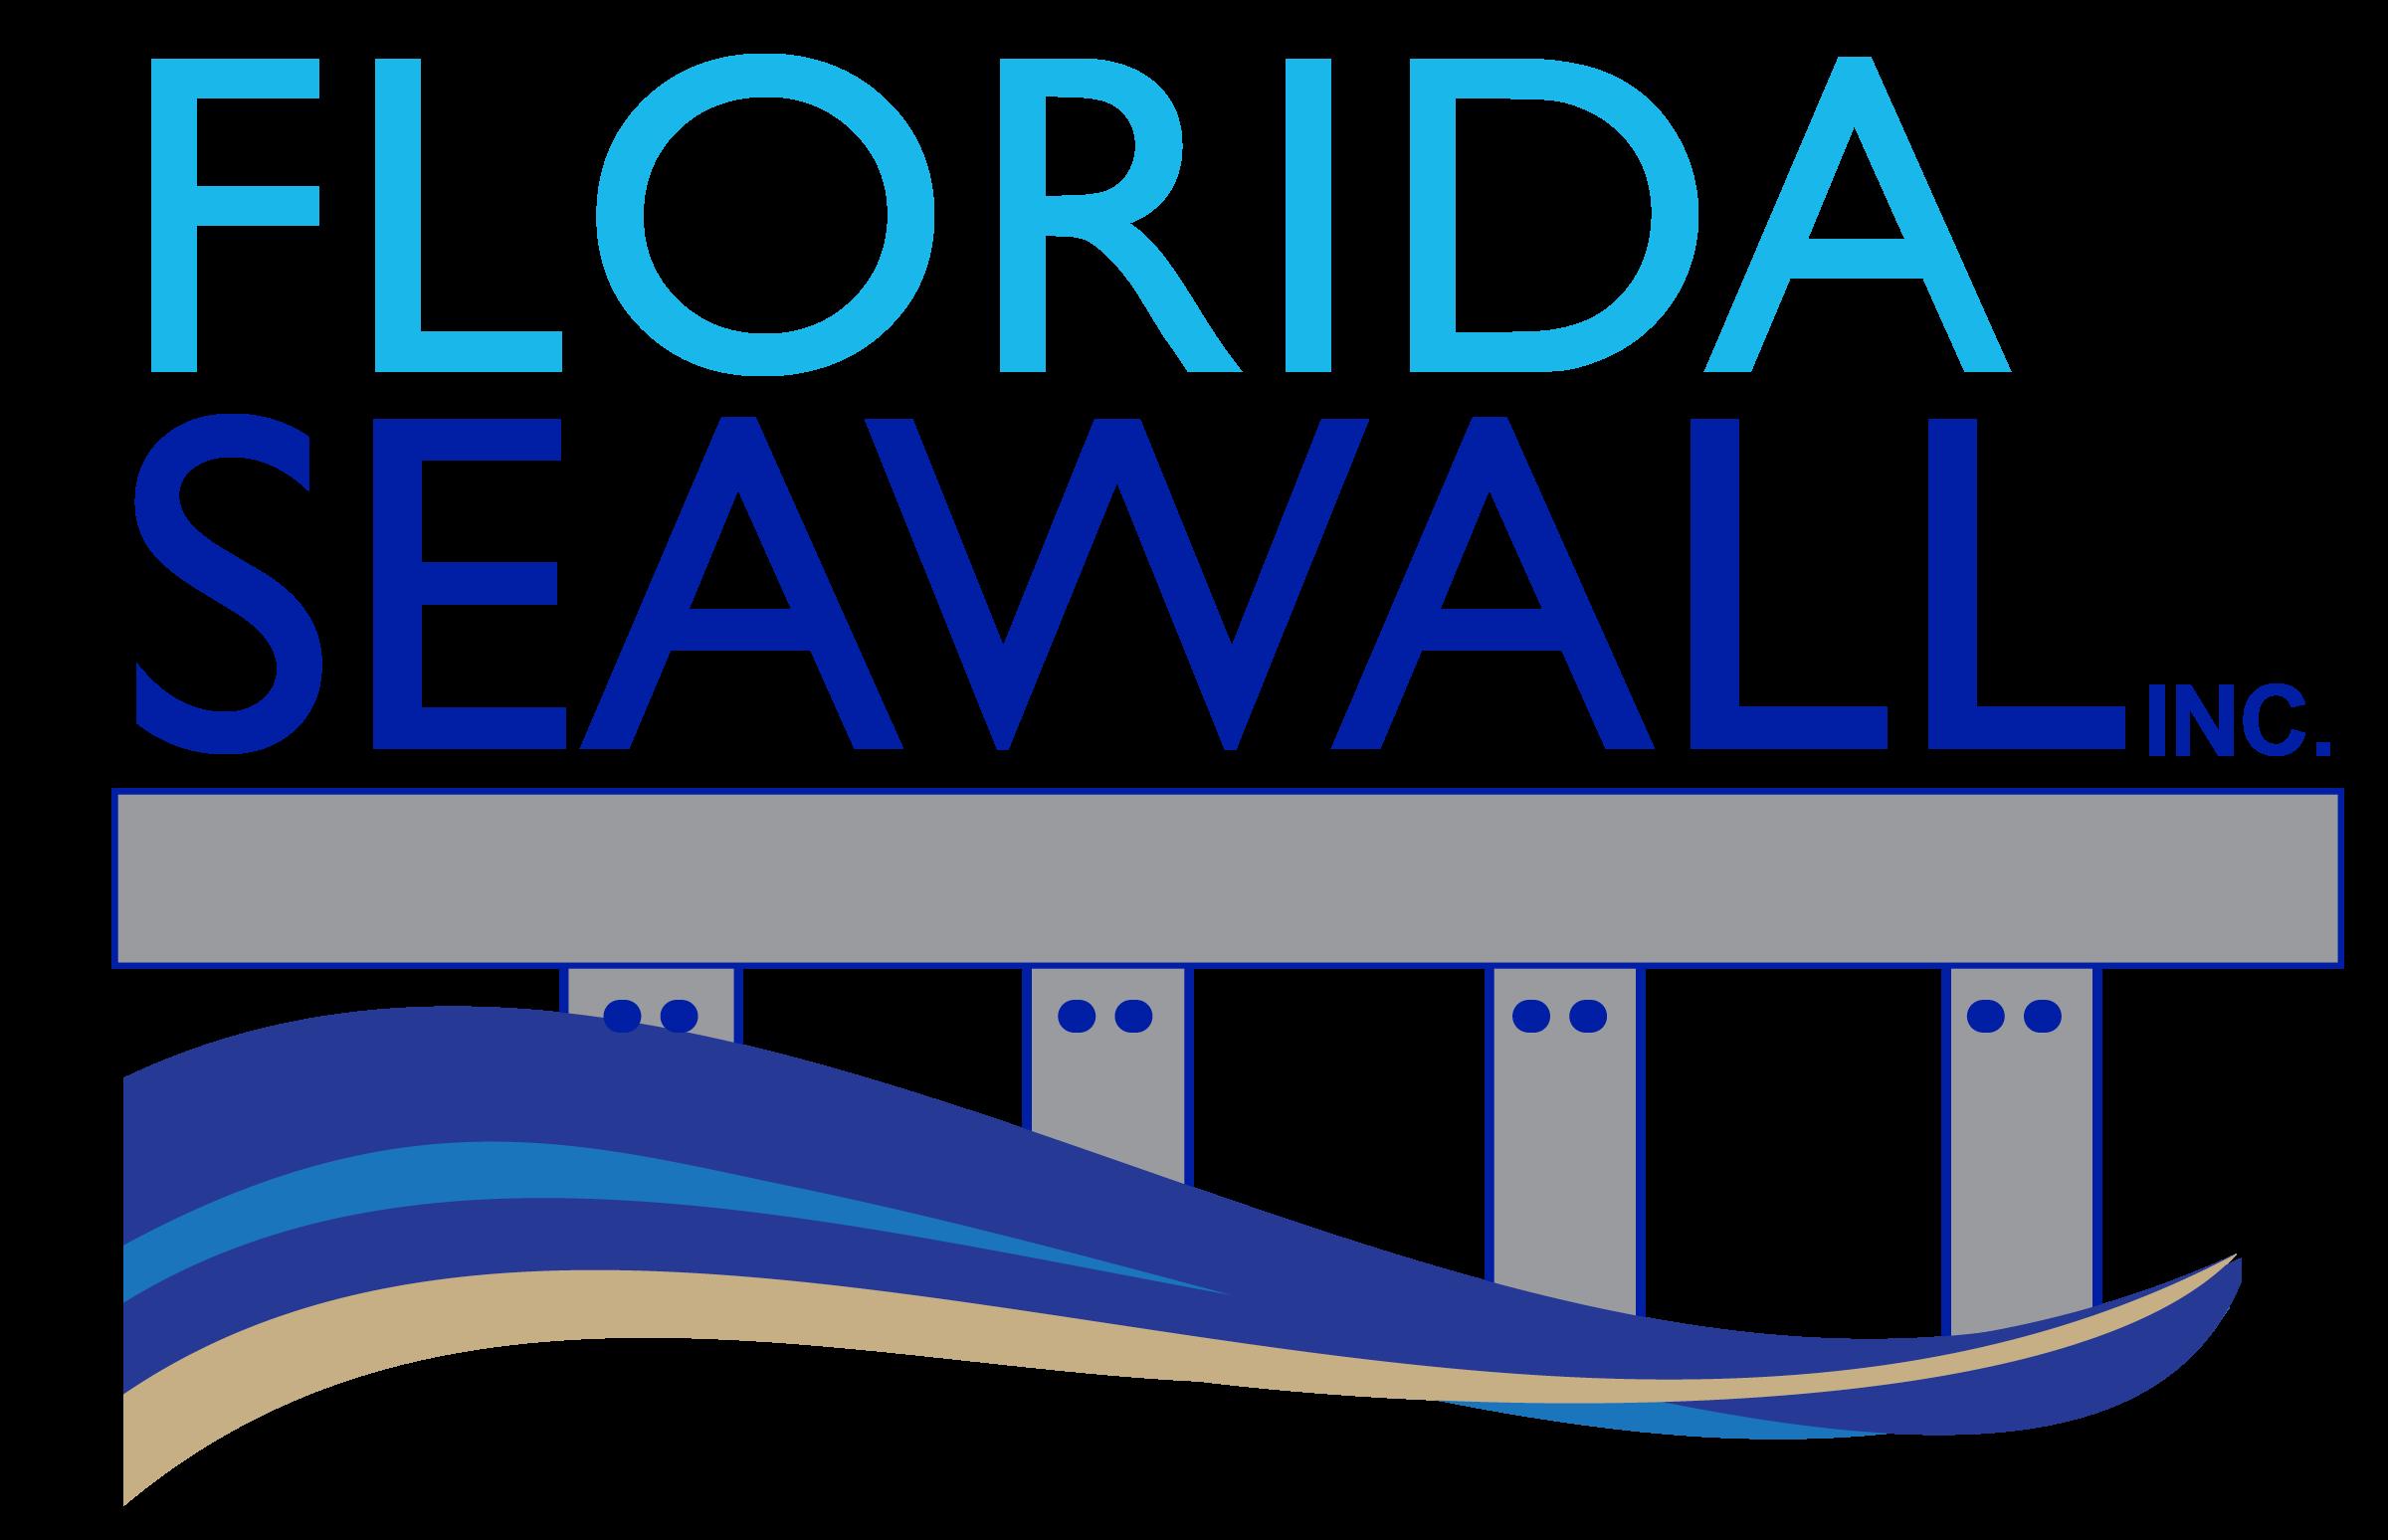 FLORIDA SEWALL INC